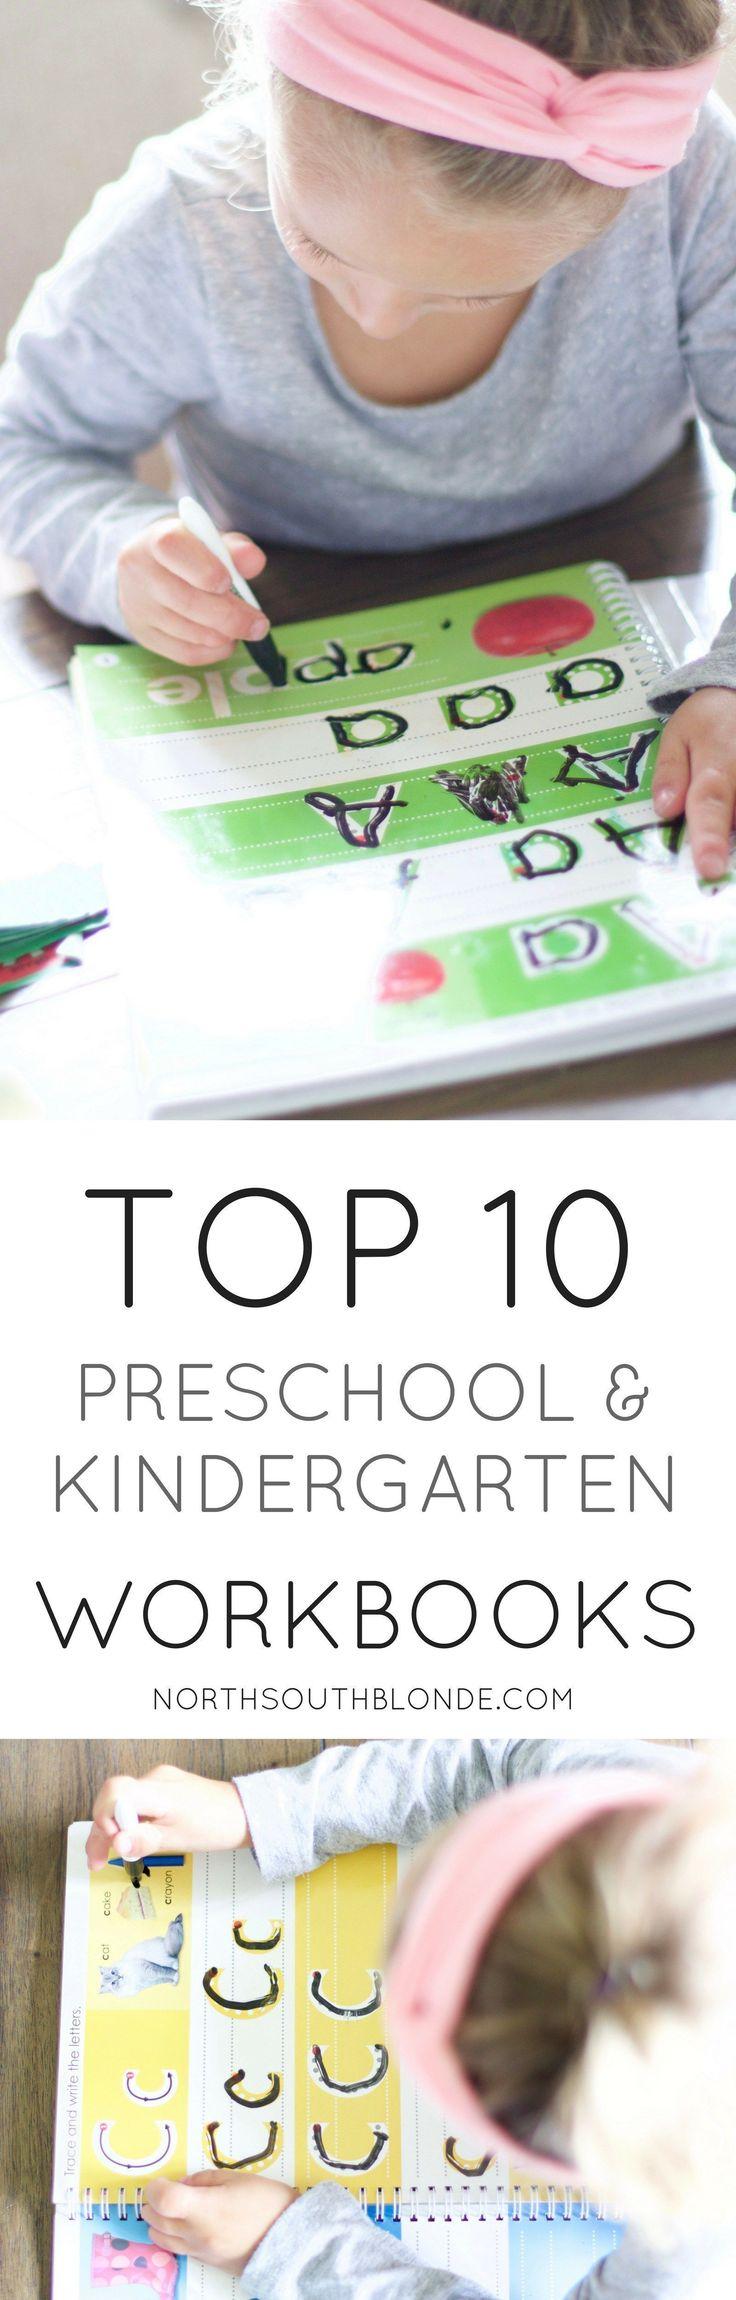 6653 best Childhood Development images on Pinterest | Kids ...